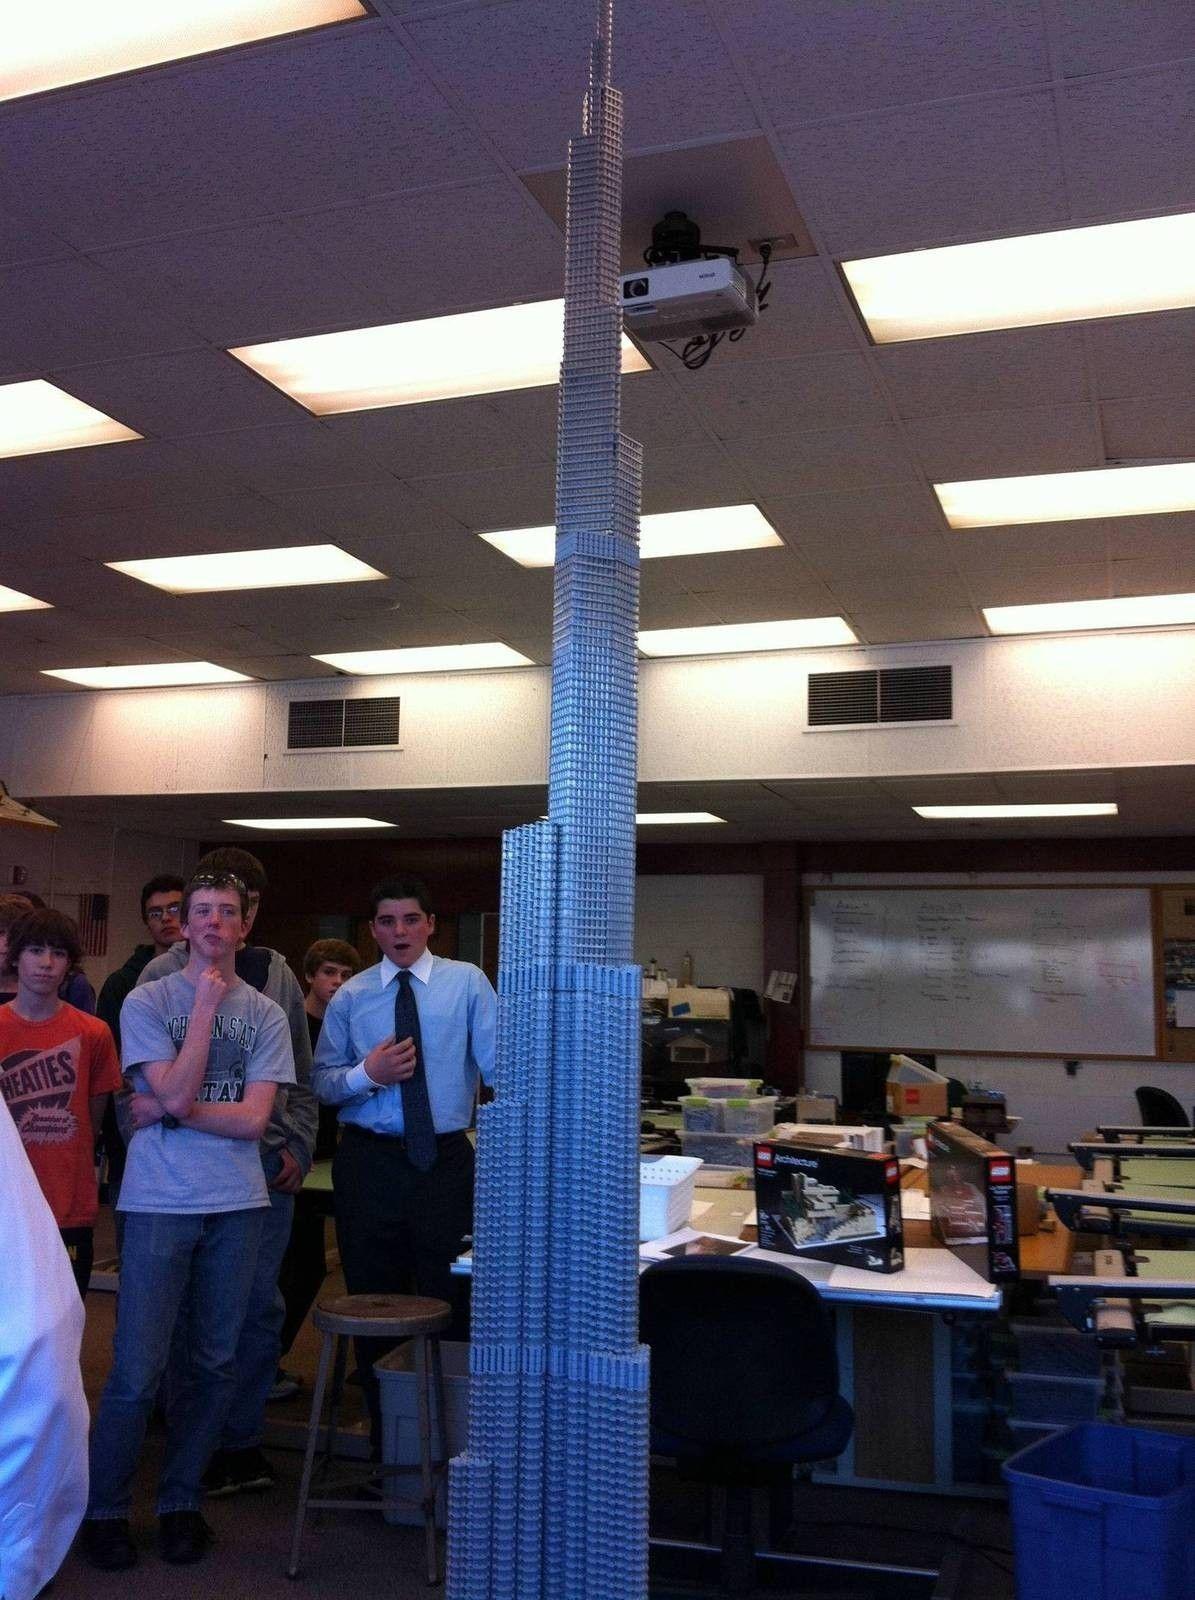 Lego Mania - Burj Khalifa - 7Fe8p.jpg